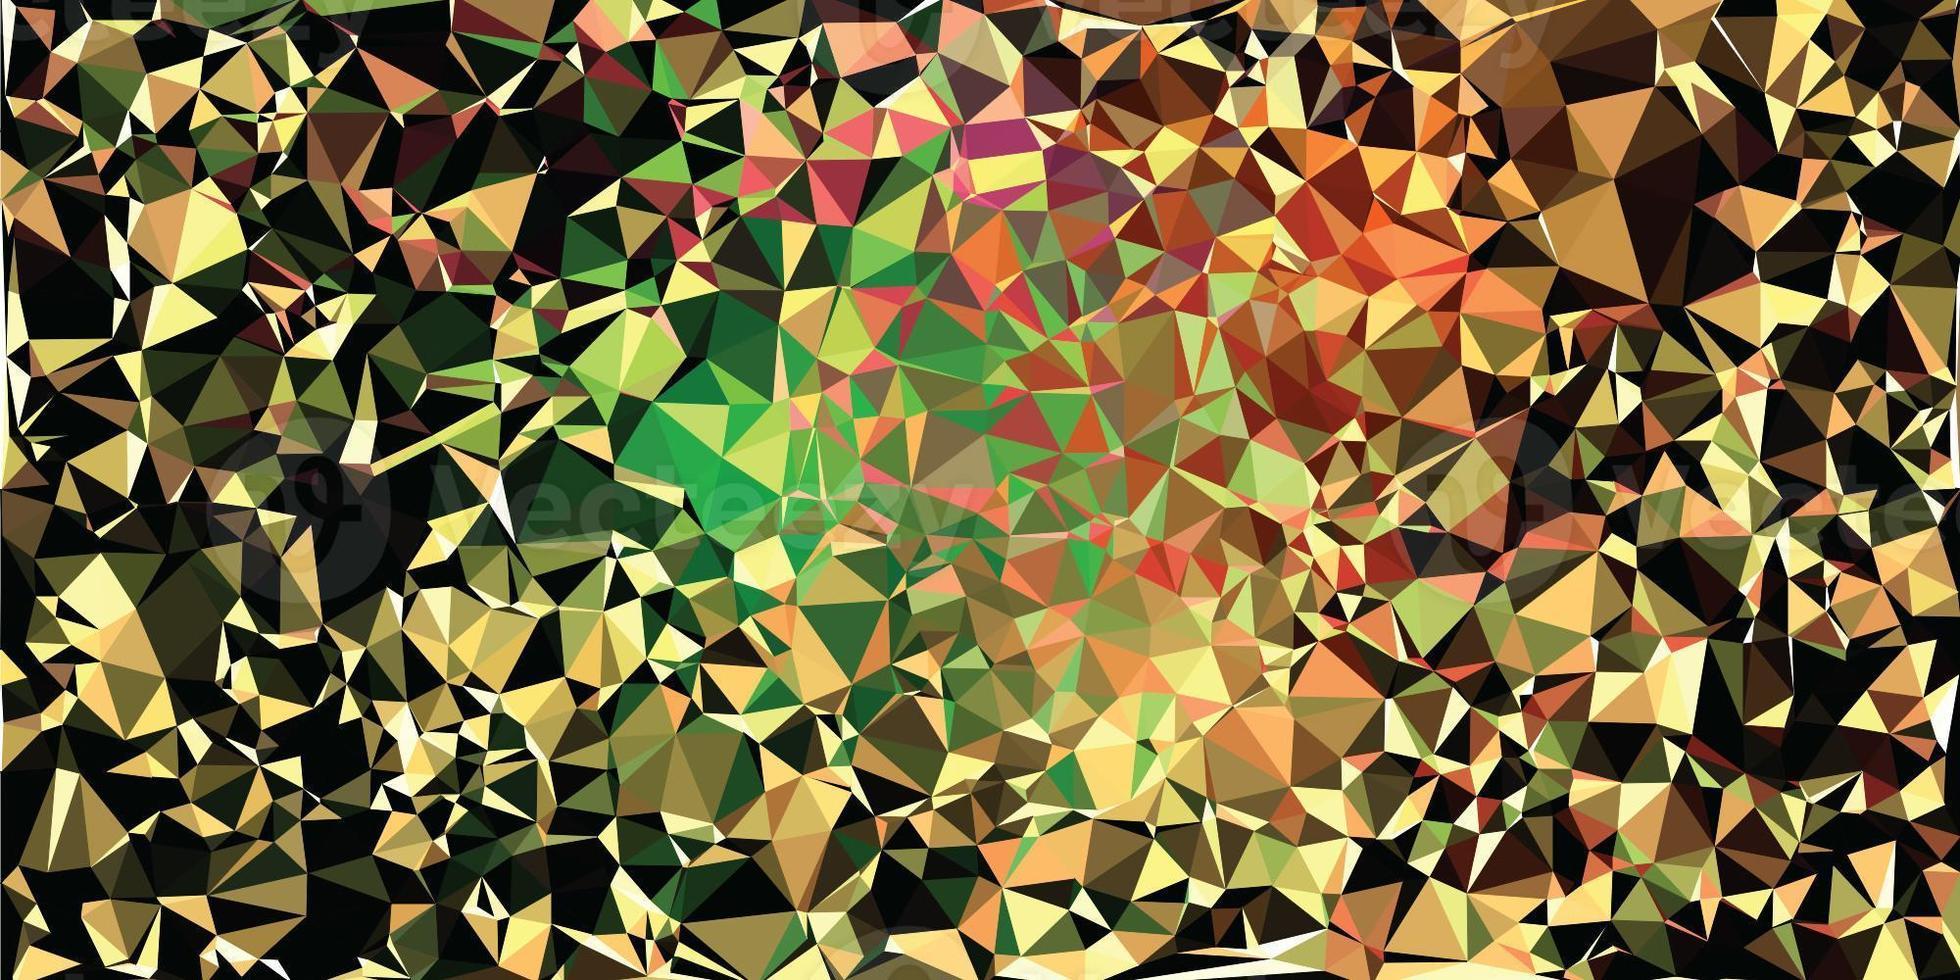 geometric background wallpaper photo